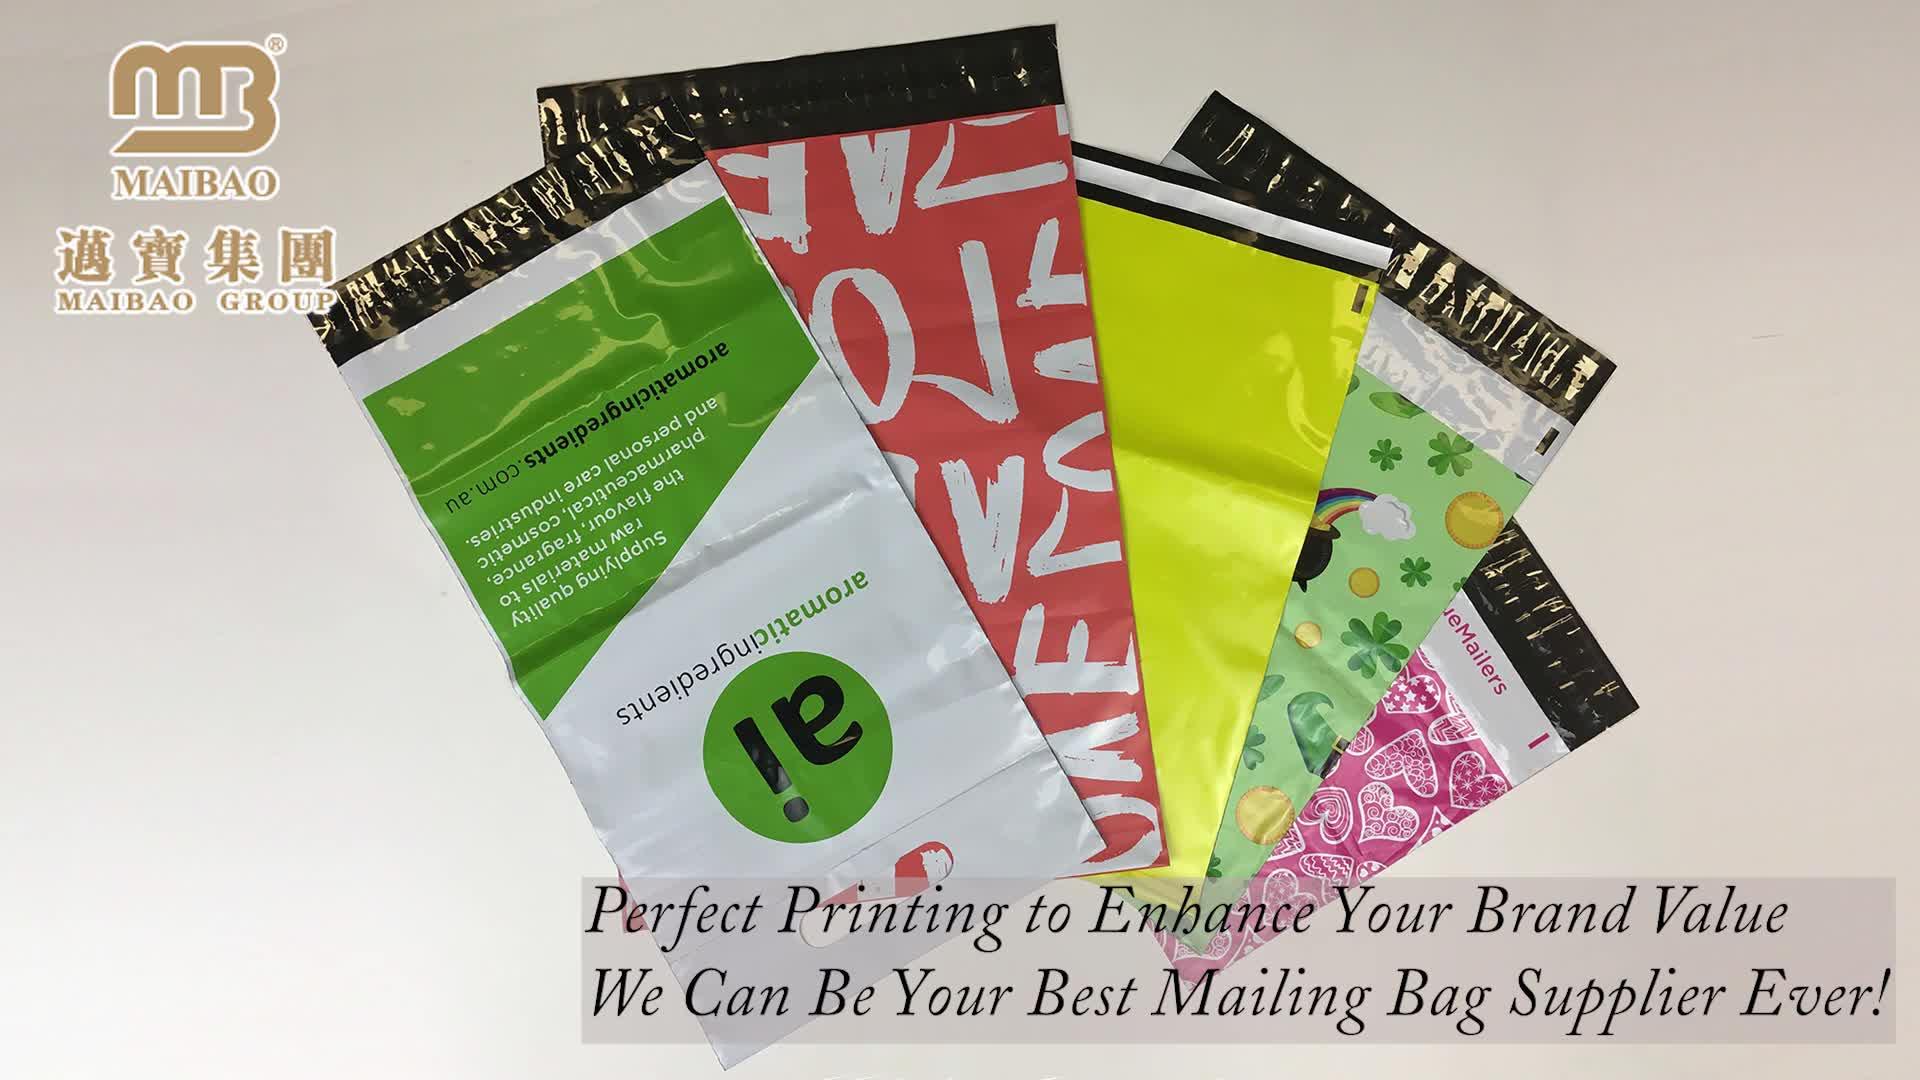 खाद Biodegradable कस्टम डिजाइन पर्यावरण के अनुकूल प्लास्टिक परिधान डाक कूरियर मेल मेलिंग प्रकाश गुलाबी पाली मेलर बैग